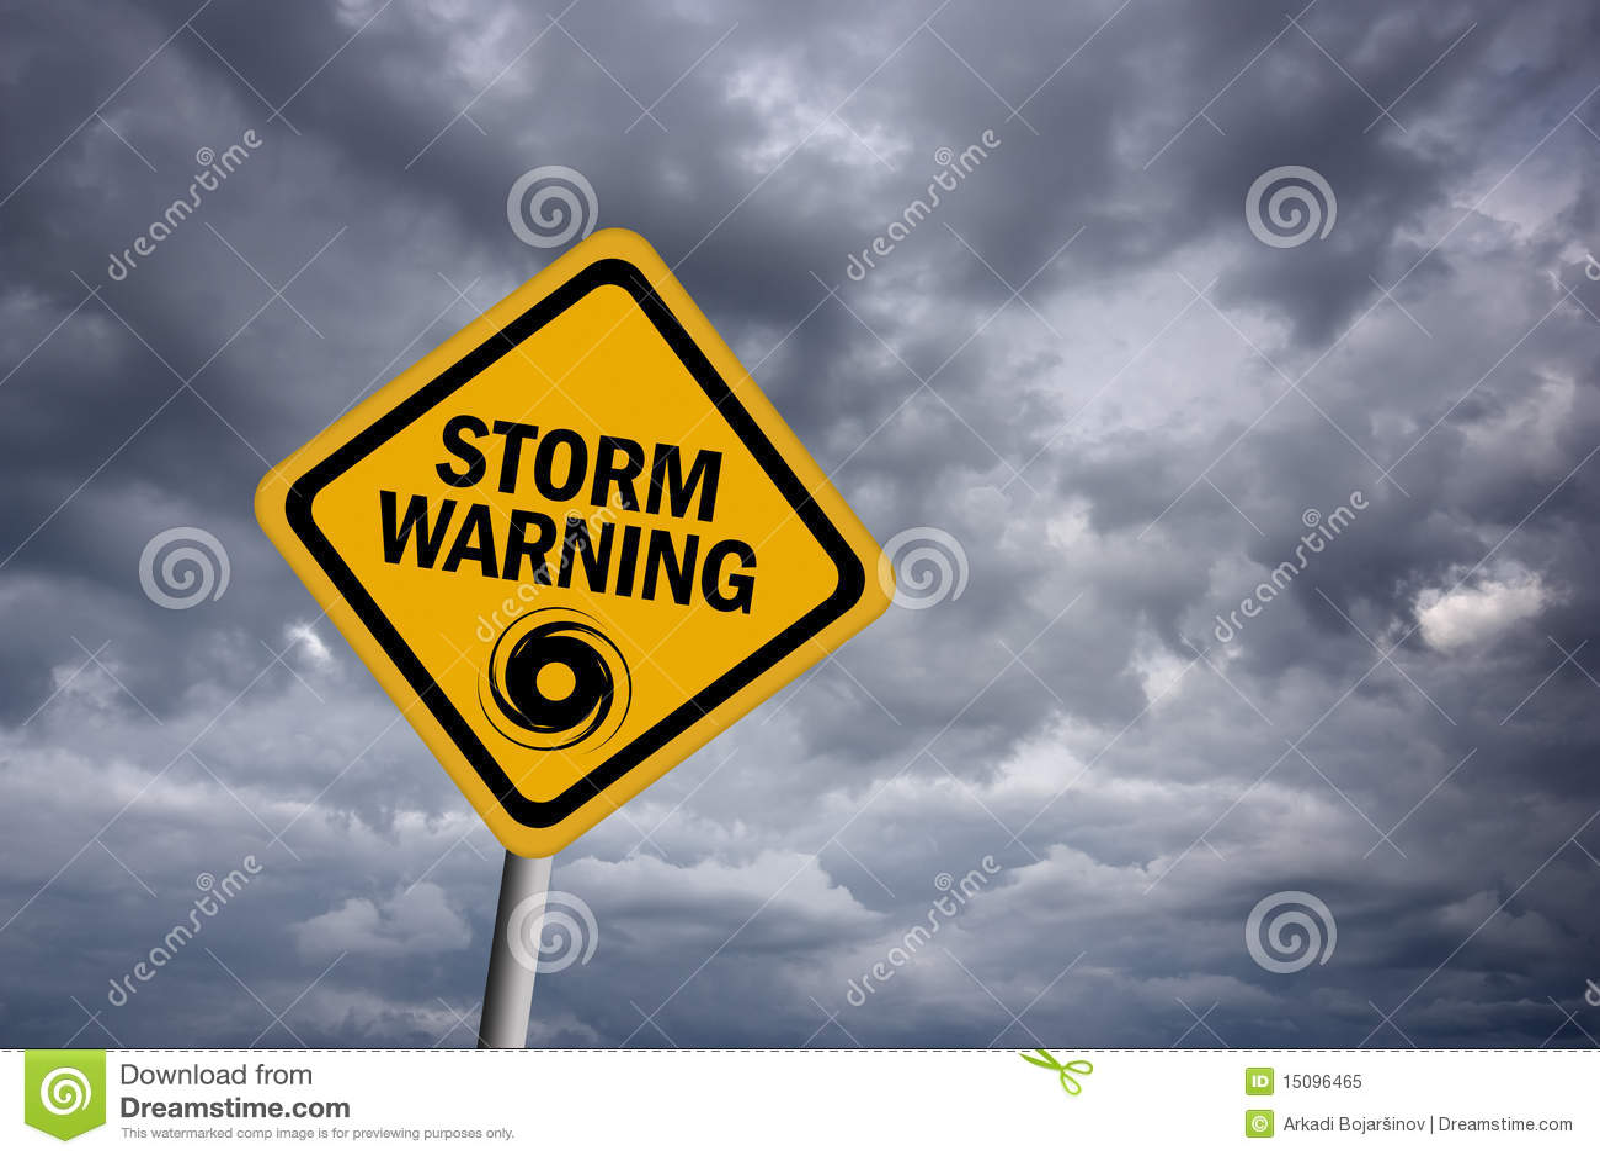 Storm Warning Sign Royalty Free Stock Photo - Image: 15096465